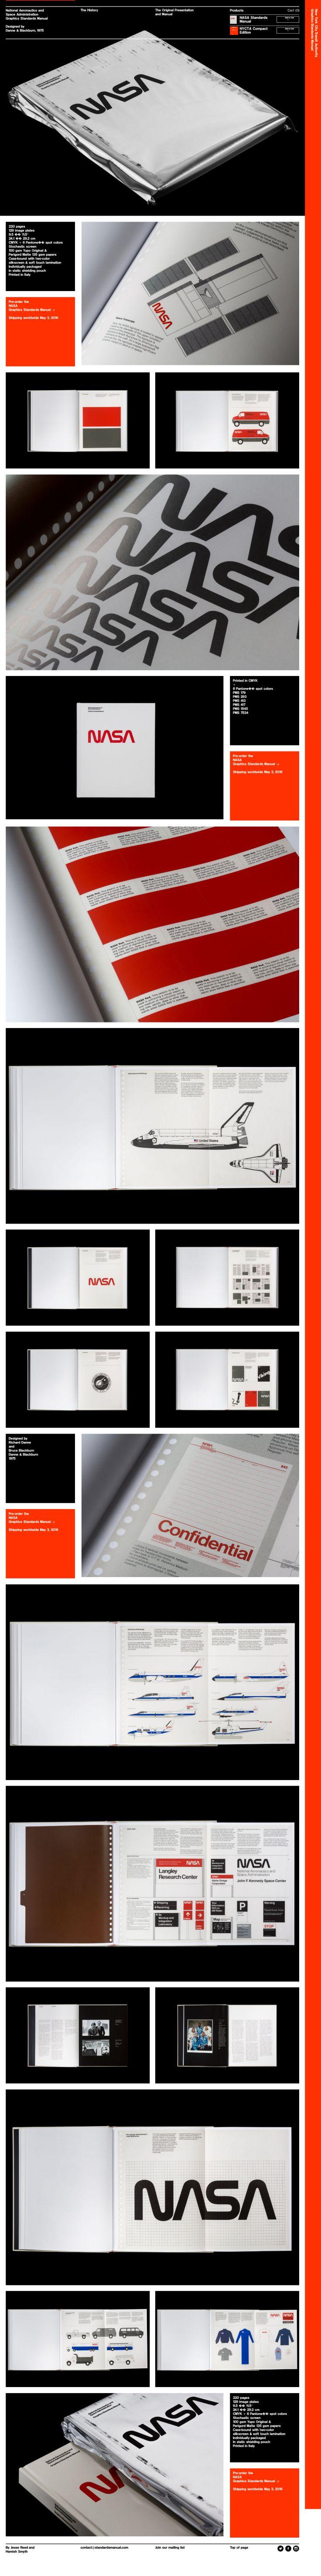 branding / Identity | Nasa Design Manual — standardsmanual.com